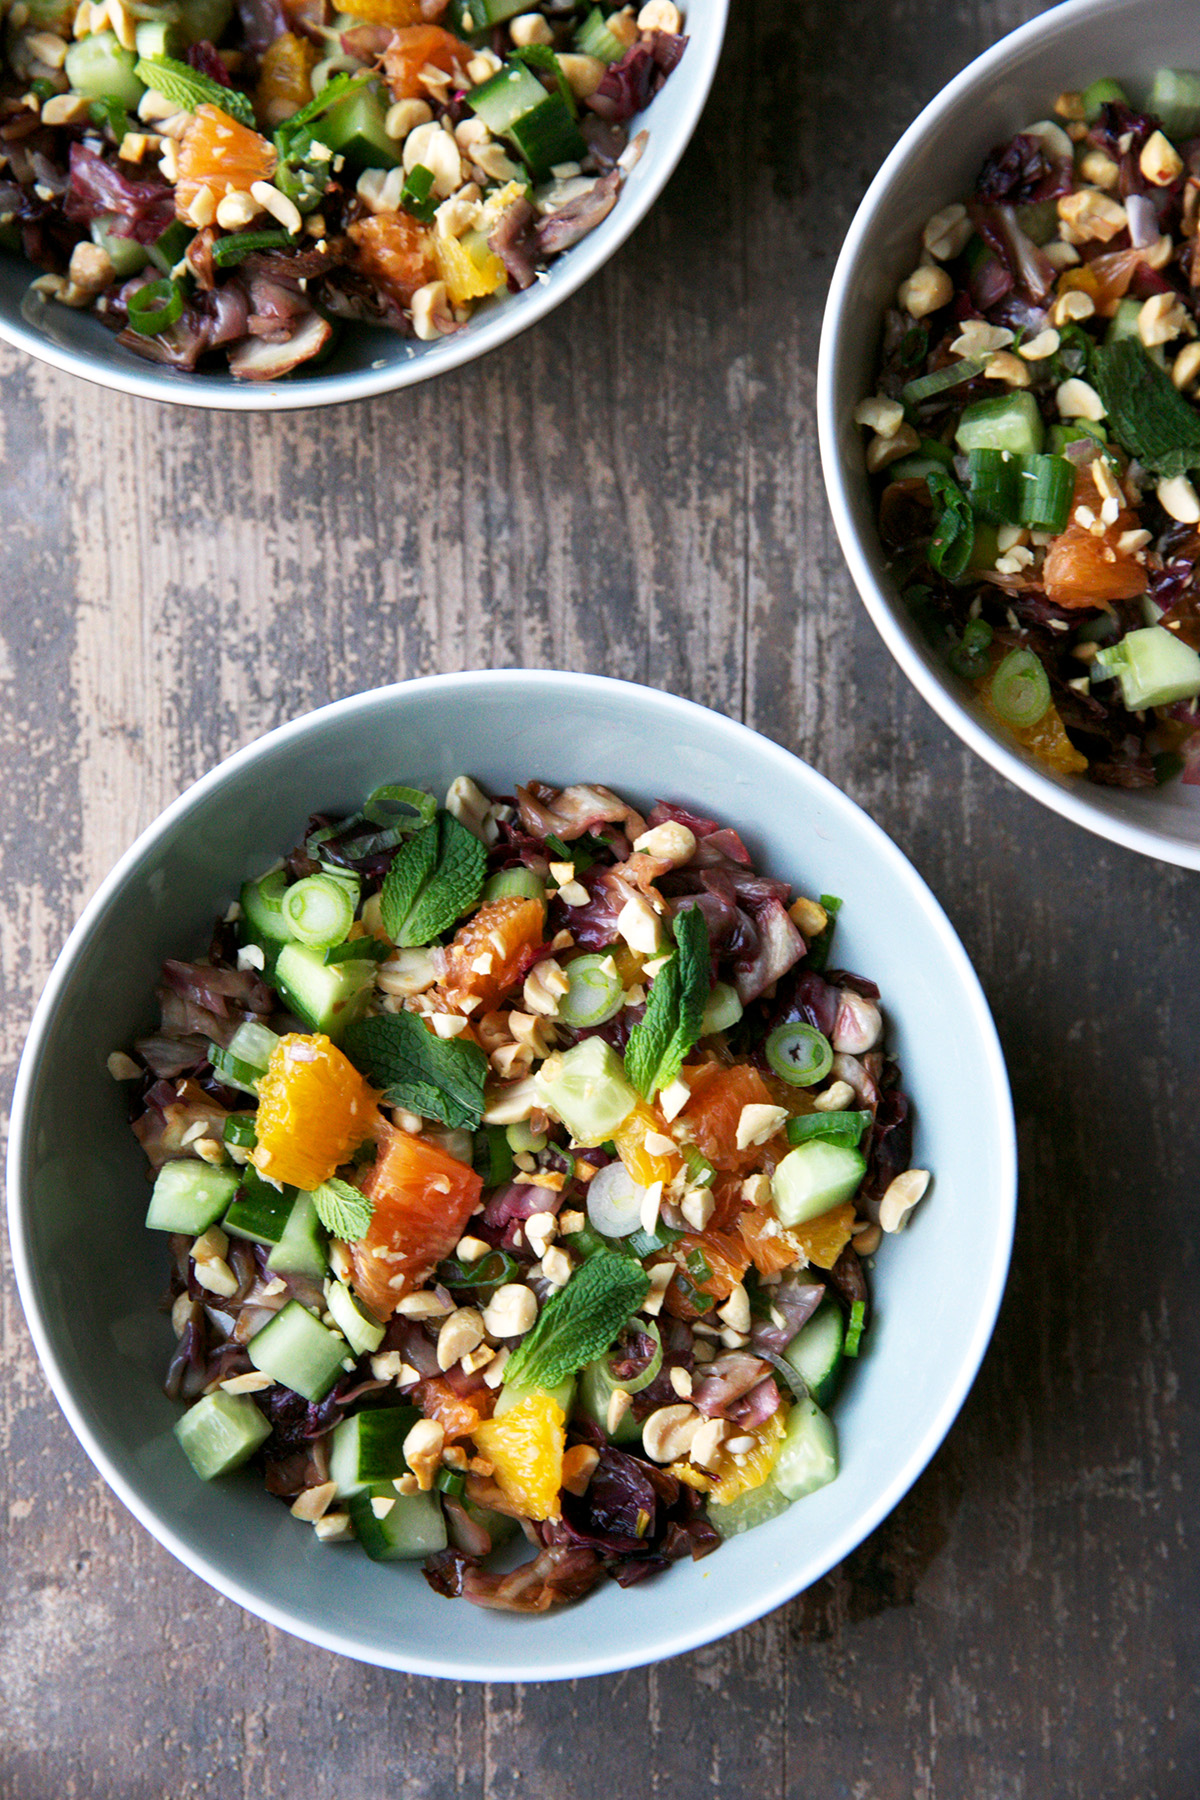 Radicchio Salad With Oranges and Mint